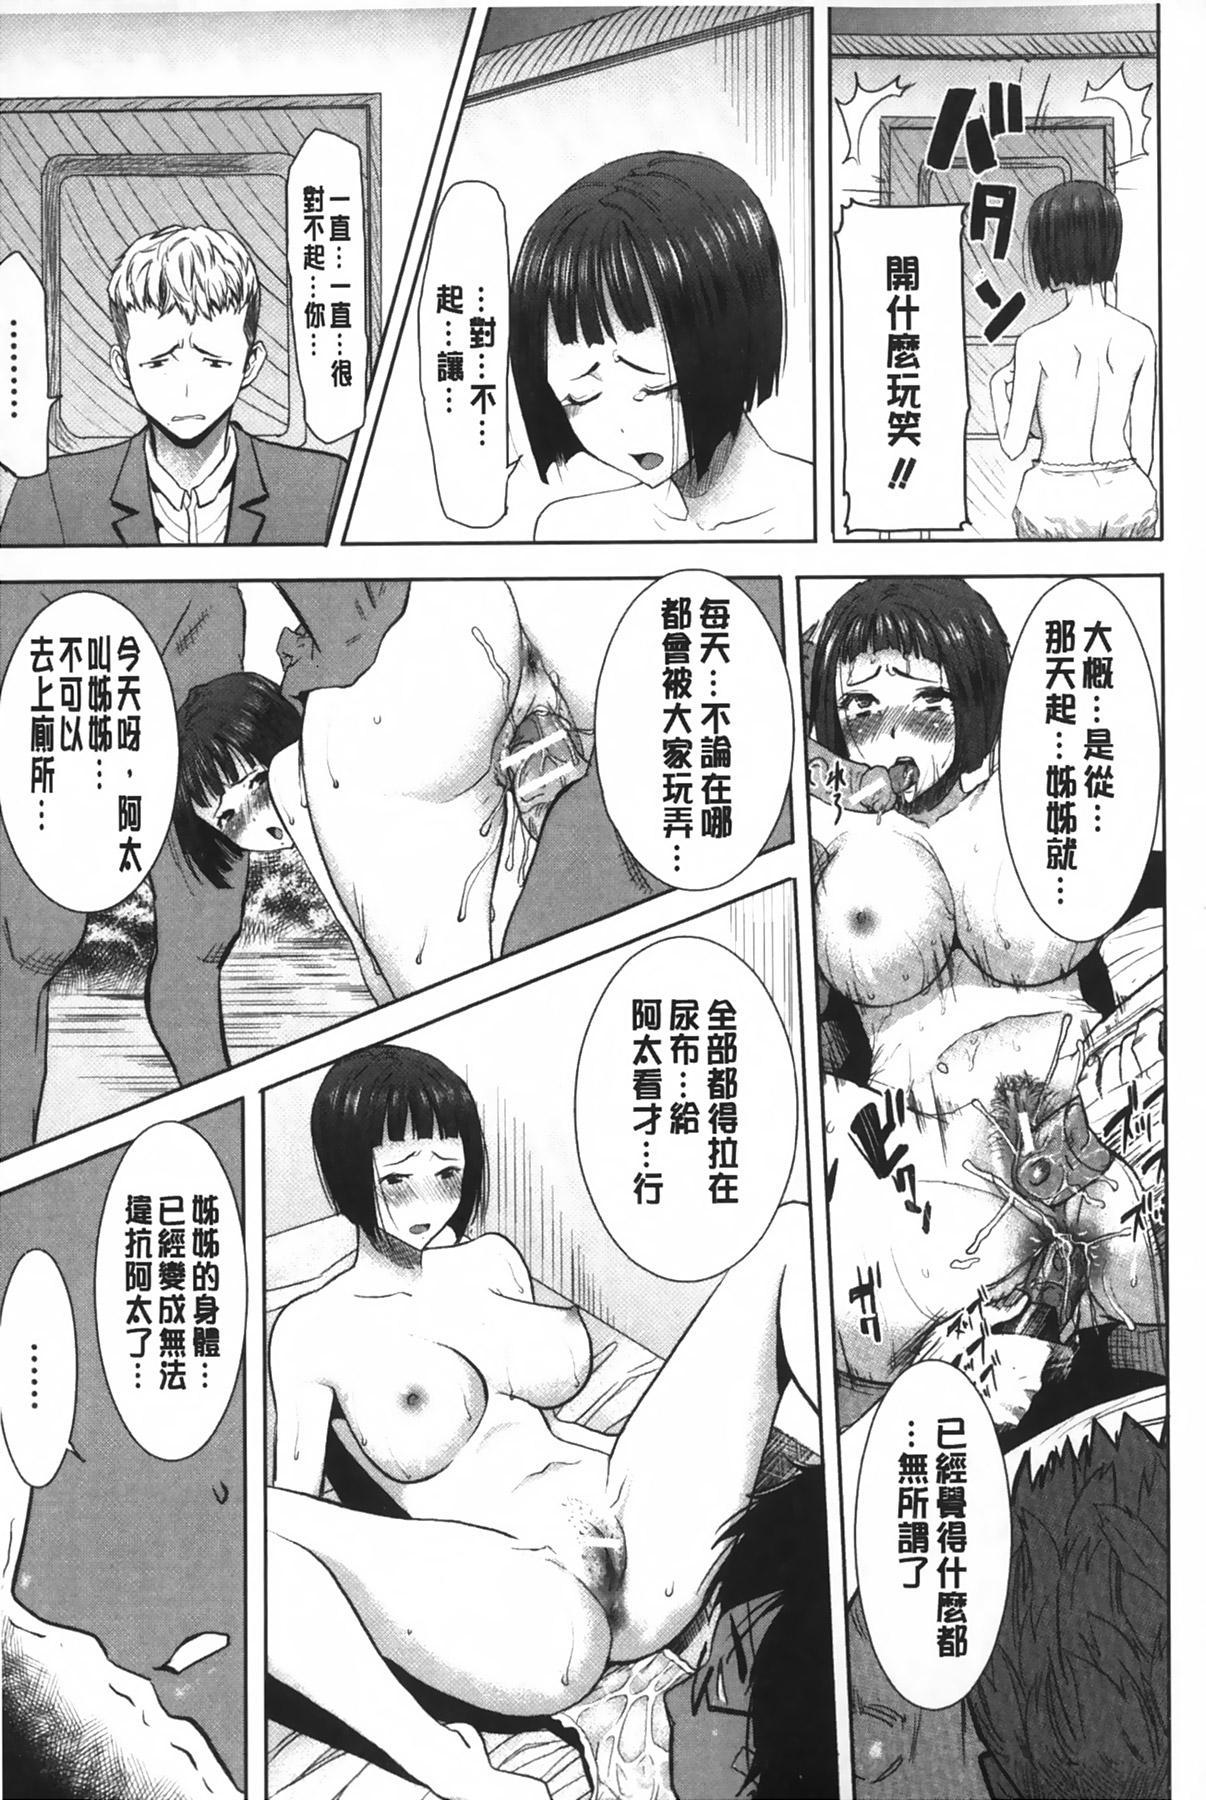 Ane Unsweet - Mihiragi Hiyori + | 姊姊不甜美 彌平木日和+ 111